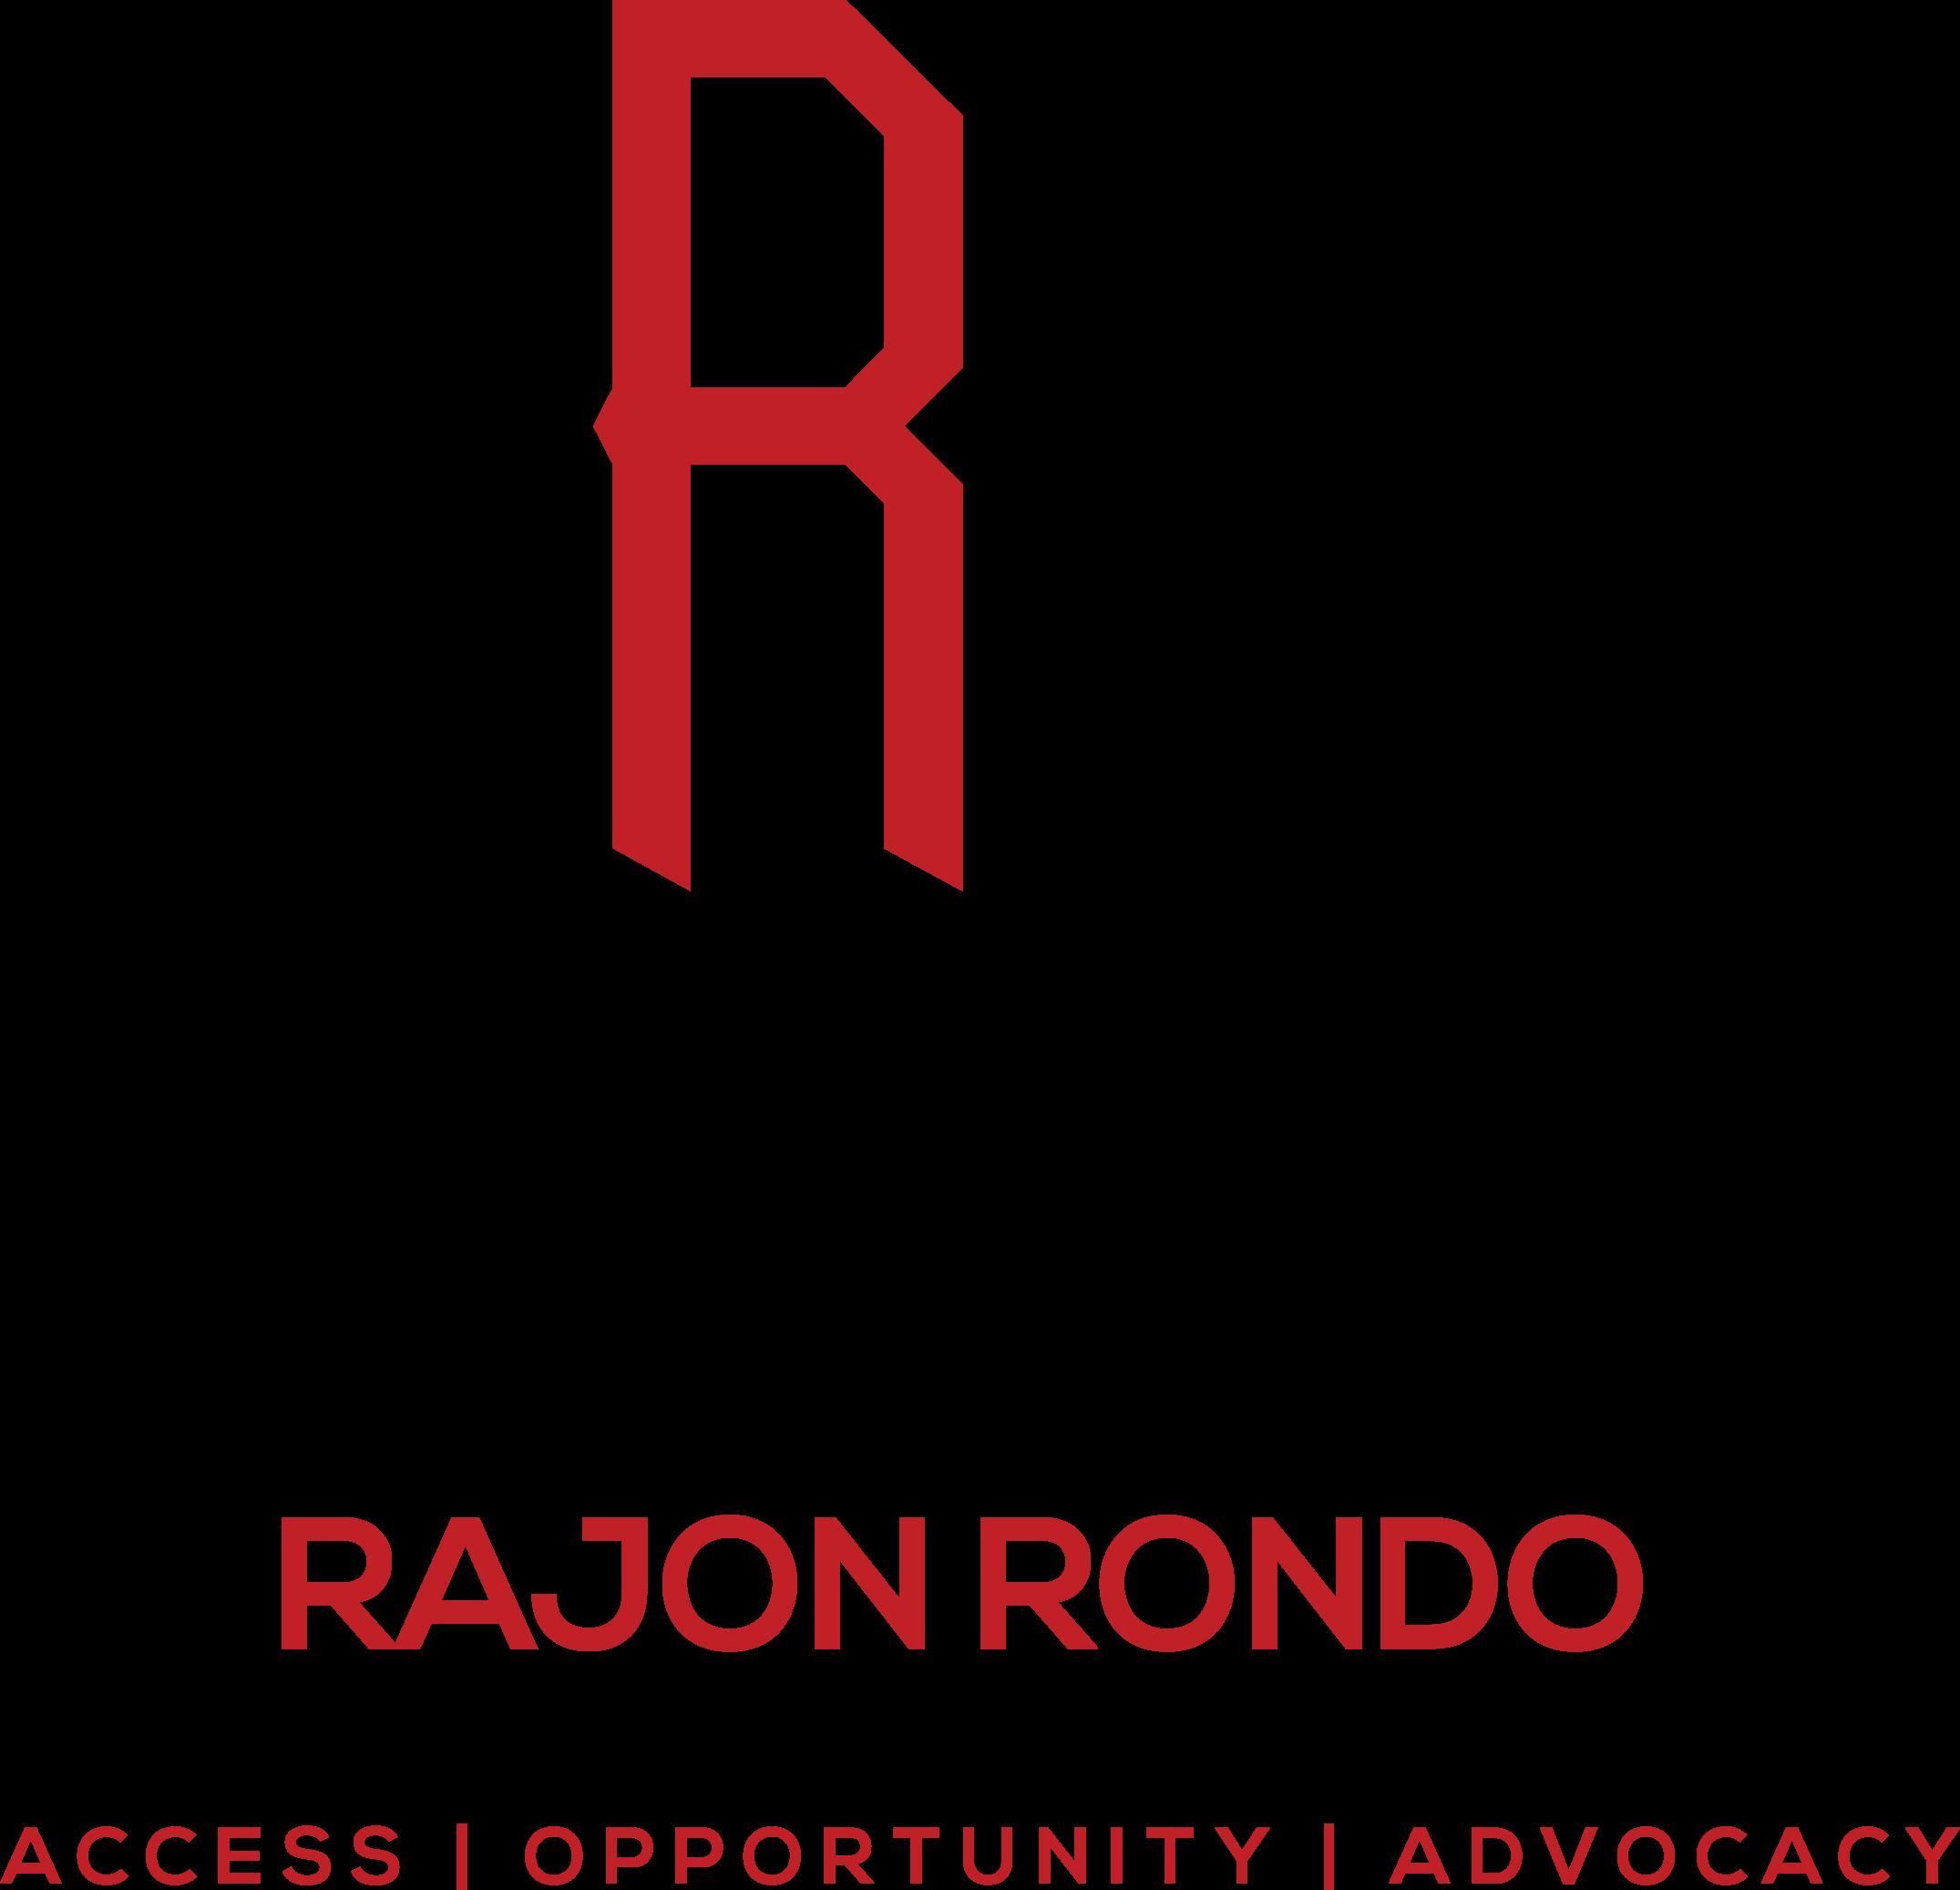 RondoFoundation.png